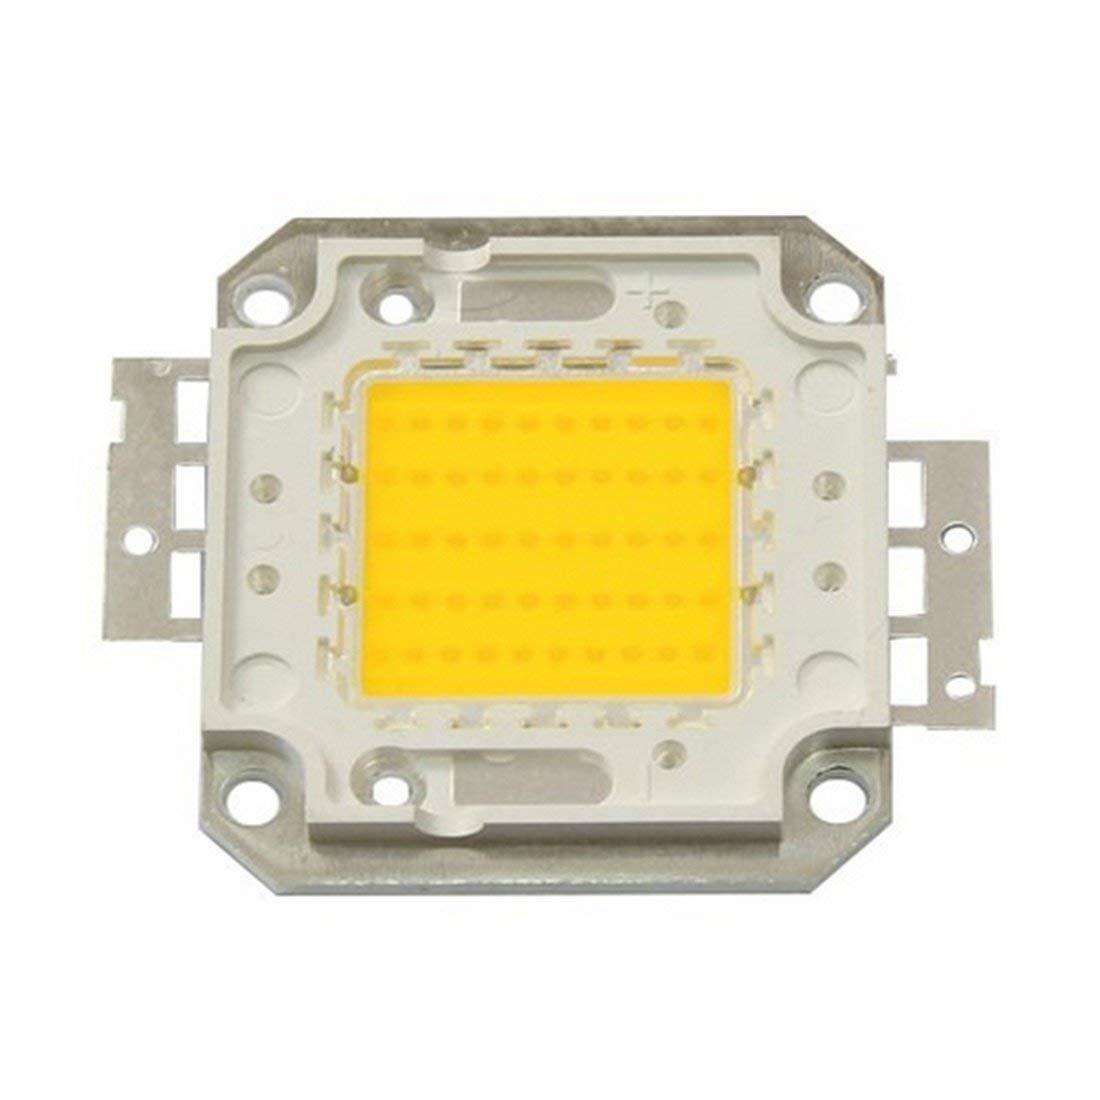 SRY-LED Bulbs High Power LED Chip Beads COB Beads 20W 30W 50W 70W 100W 3000K/6000K For Floodlight Spotlight Energy saving (Color : Cool white, Wattage : 50W)